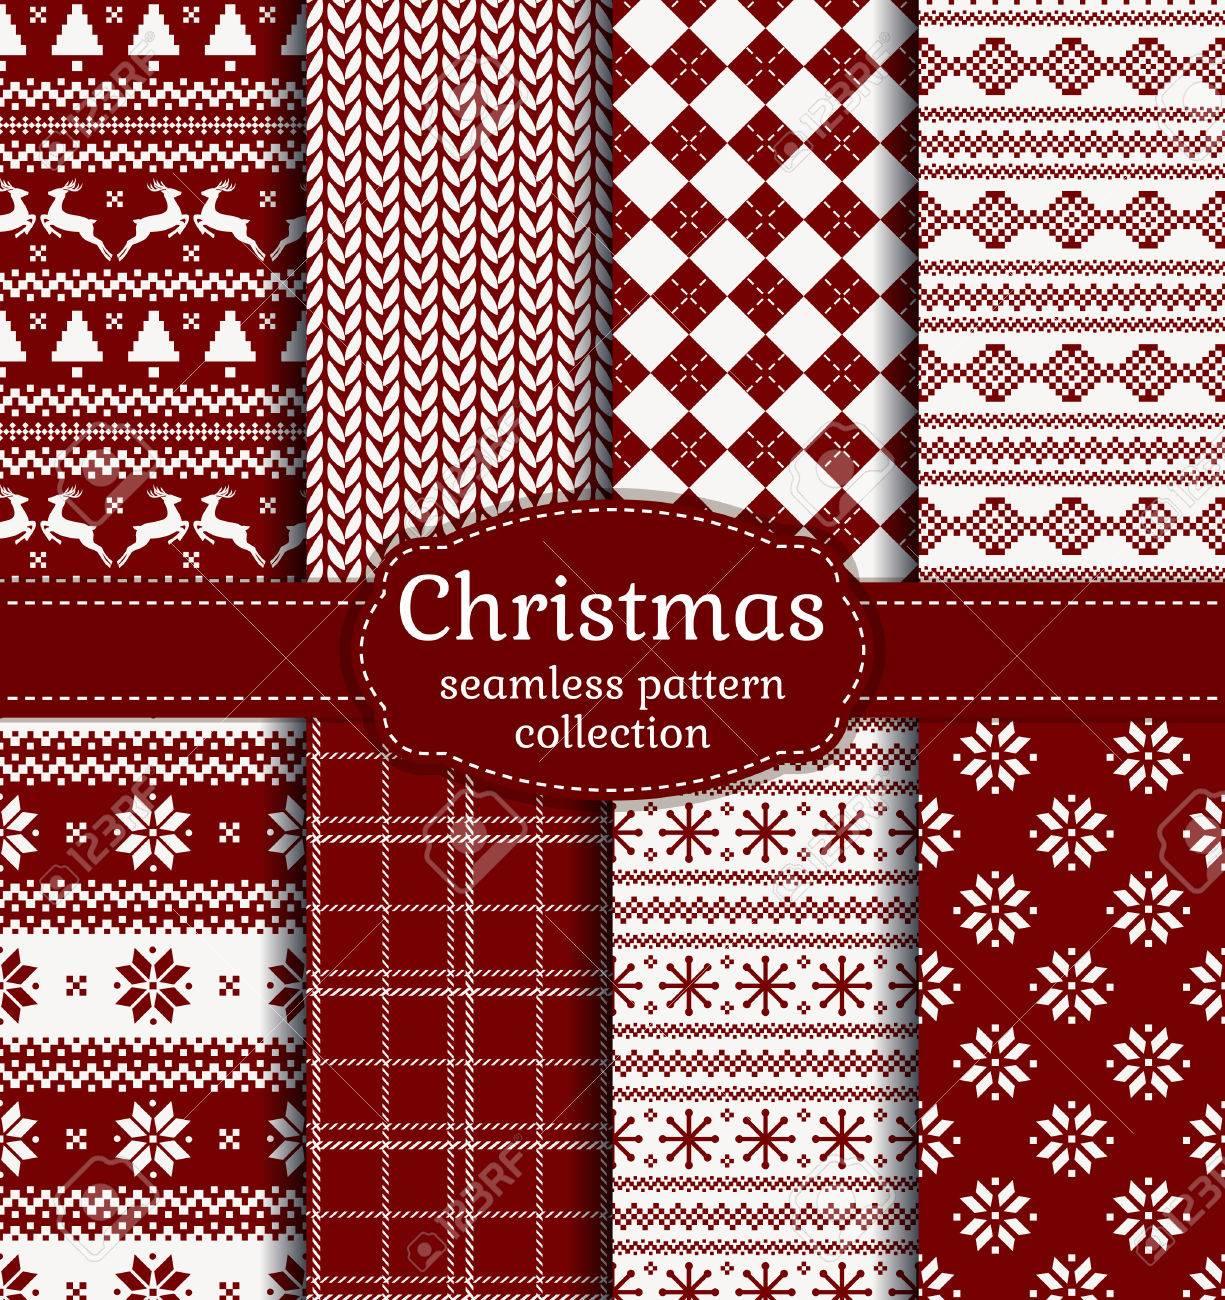 Frohe Weihnachten Norwegisch.Stock Photo